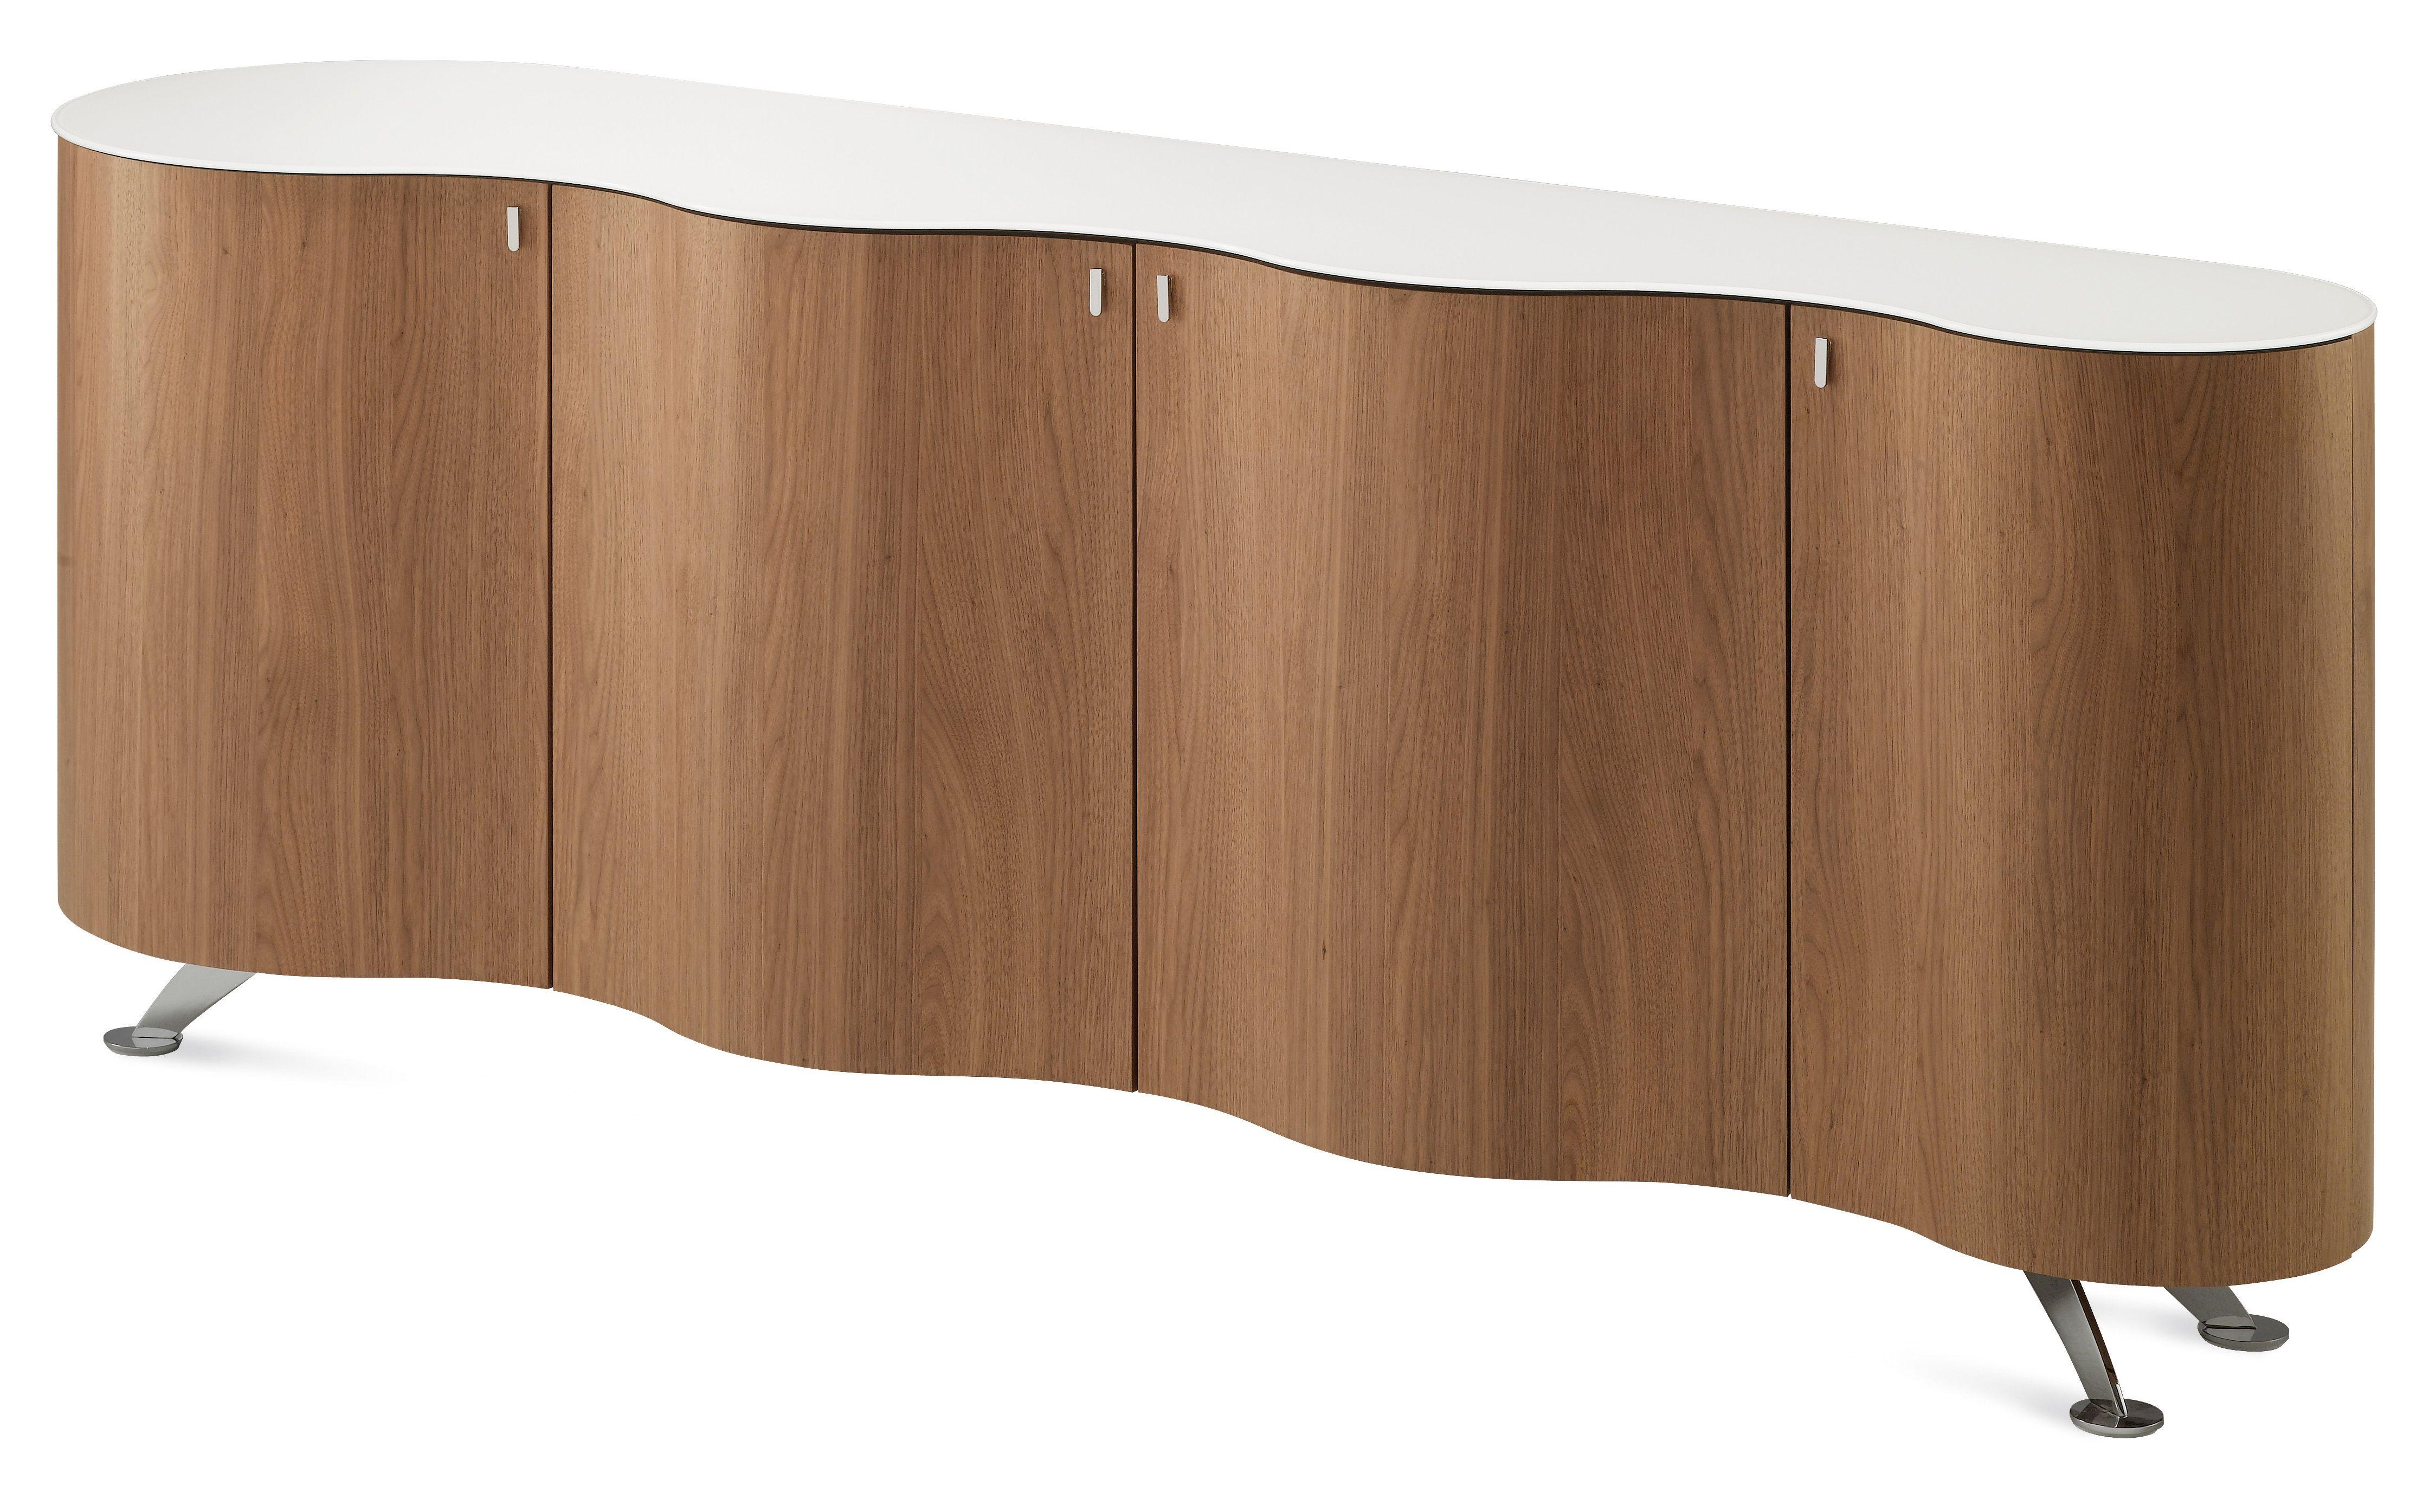 palio modern sideboard in walnut finish by domitalia made in italy rh pinterest com